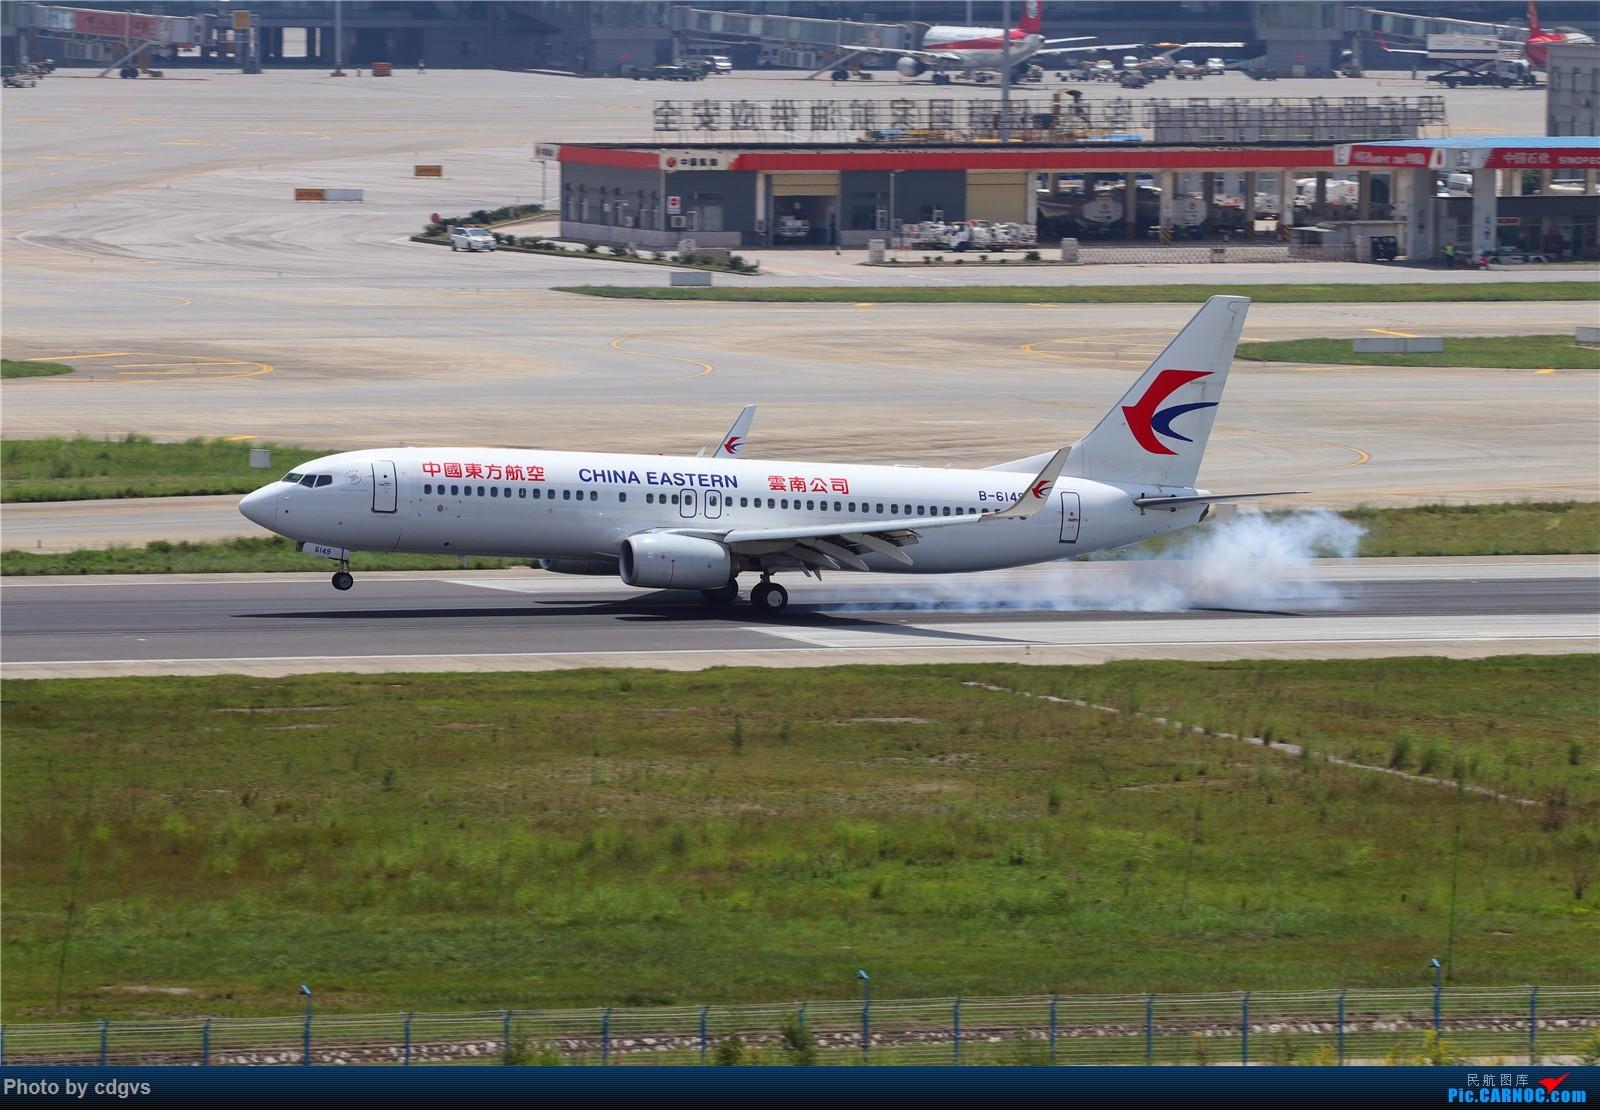 Re:[原创]【KMG】长水机场一组 1600大图 BOEING 737-800 B-6149 中国昆明长水国际机场